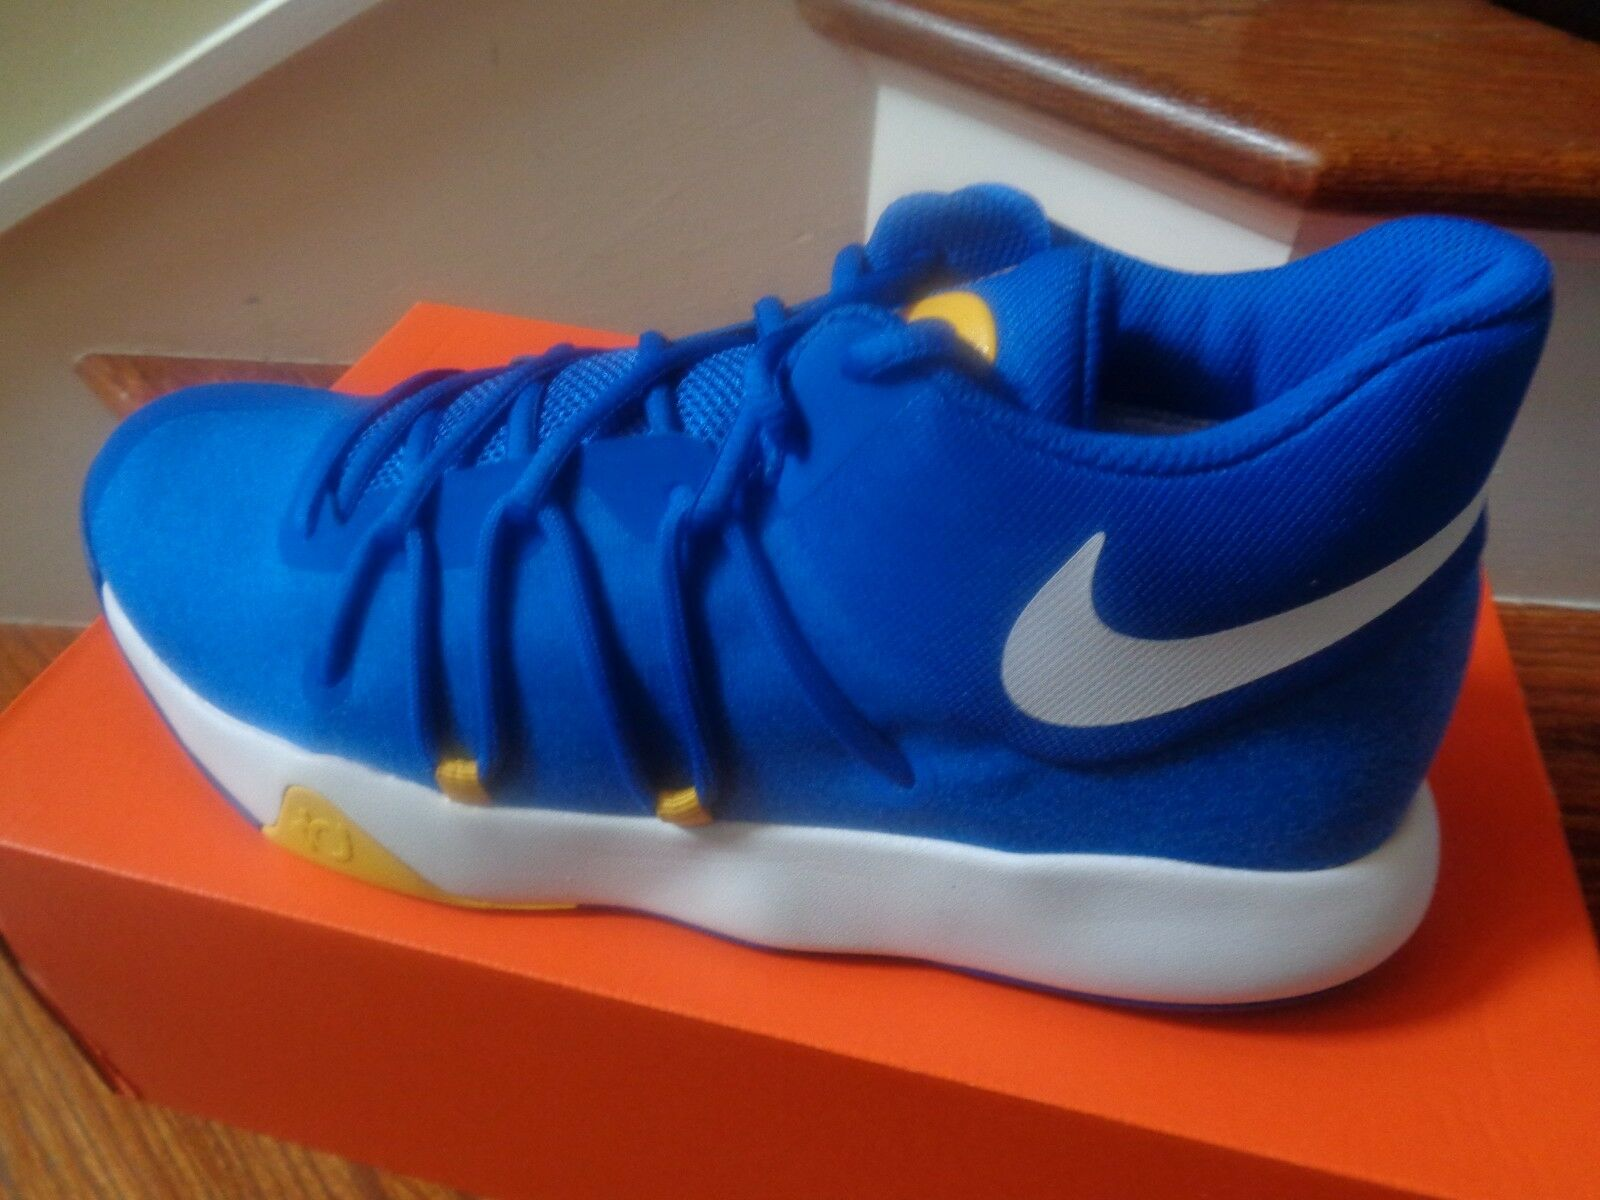 Nike KD Trey 5 V Men's Basketball shoes, 897638 400 Size 9.5 NWB